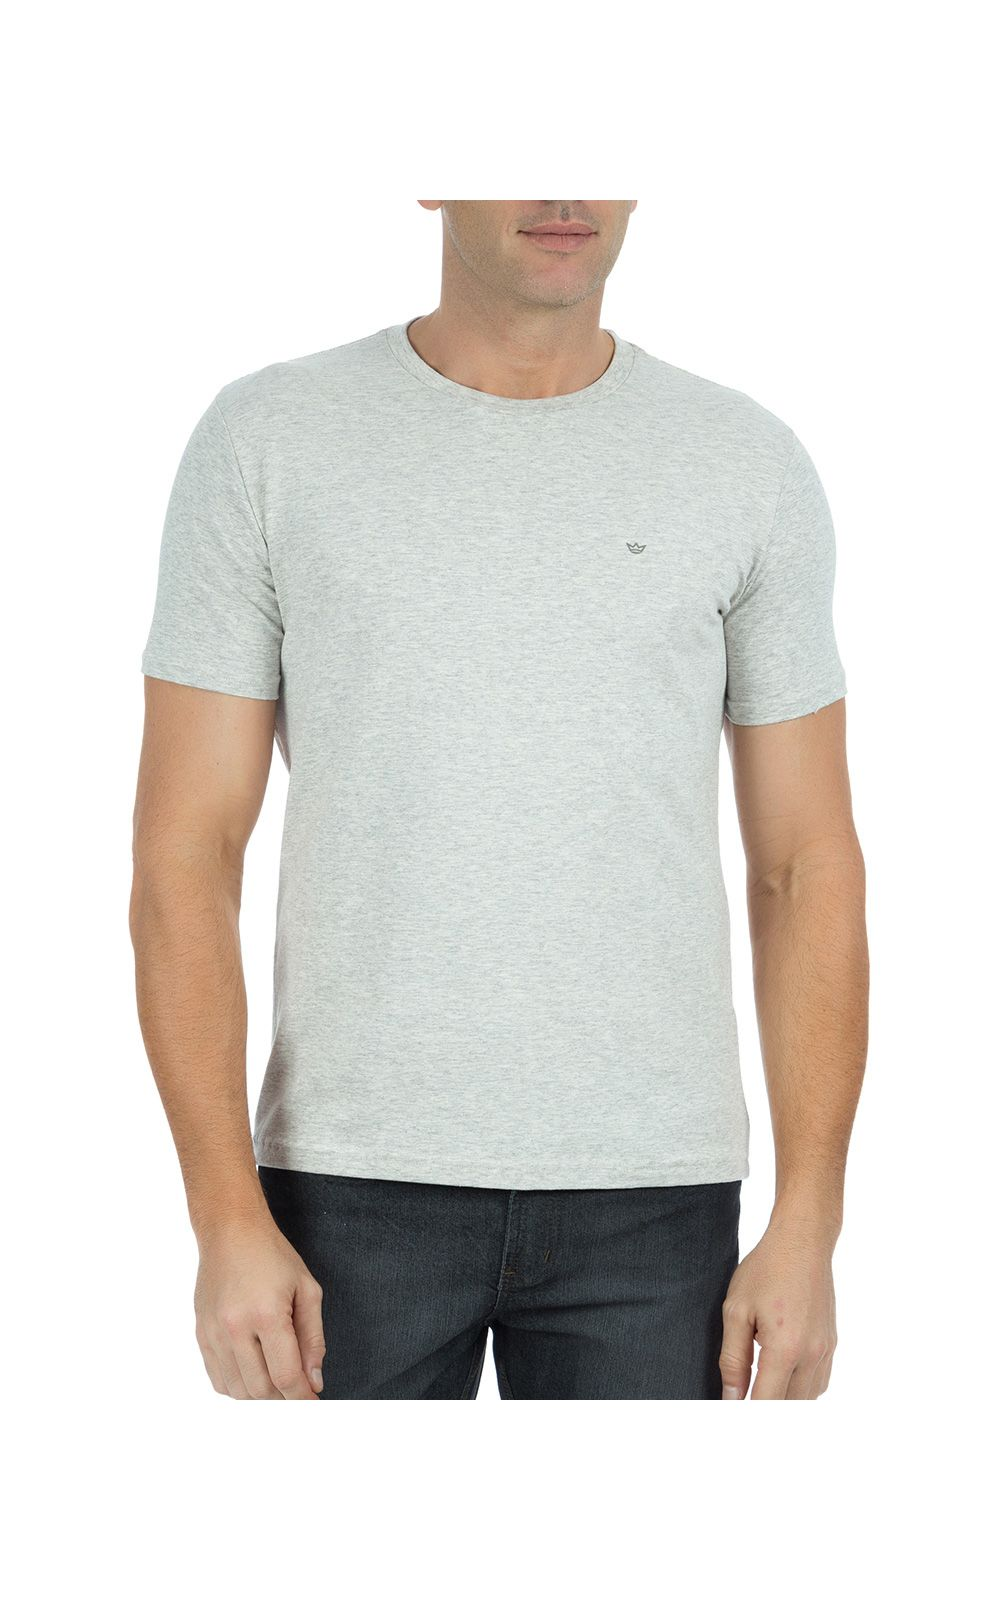 Foto 1 - Camiseta Masculina Cinza Claro